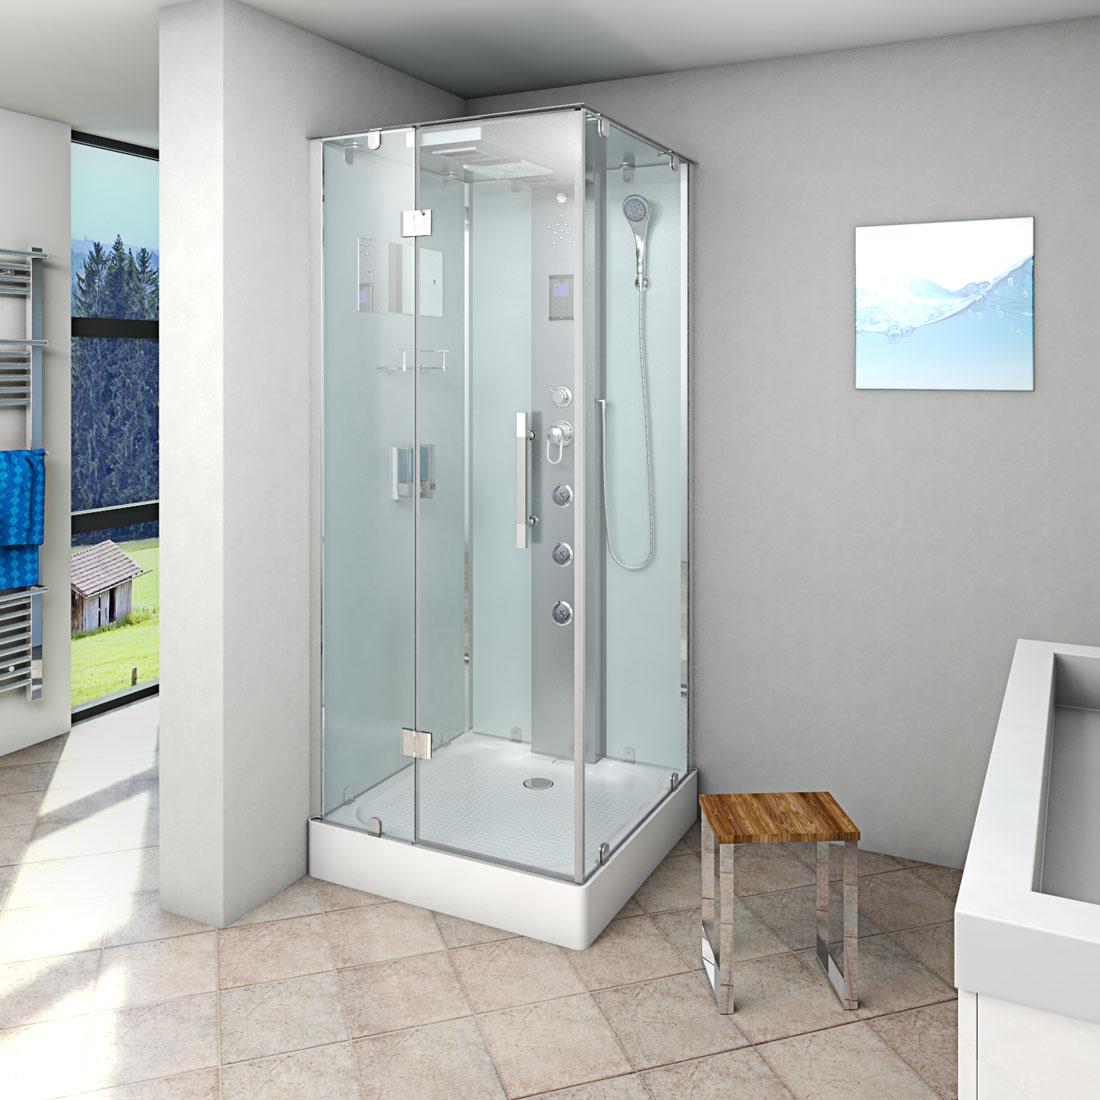 acquavapore dtp6038 0000l dusche duschtempel komplett duschkabine 80x80 ebay. Black Bedroom Furniture Sets. Home Design Ideas